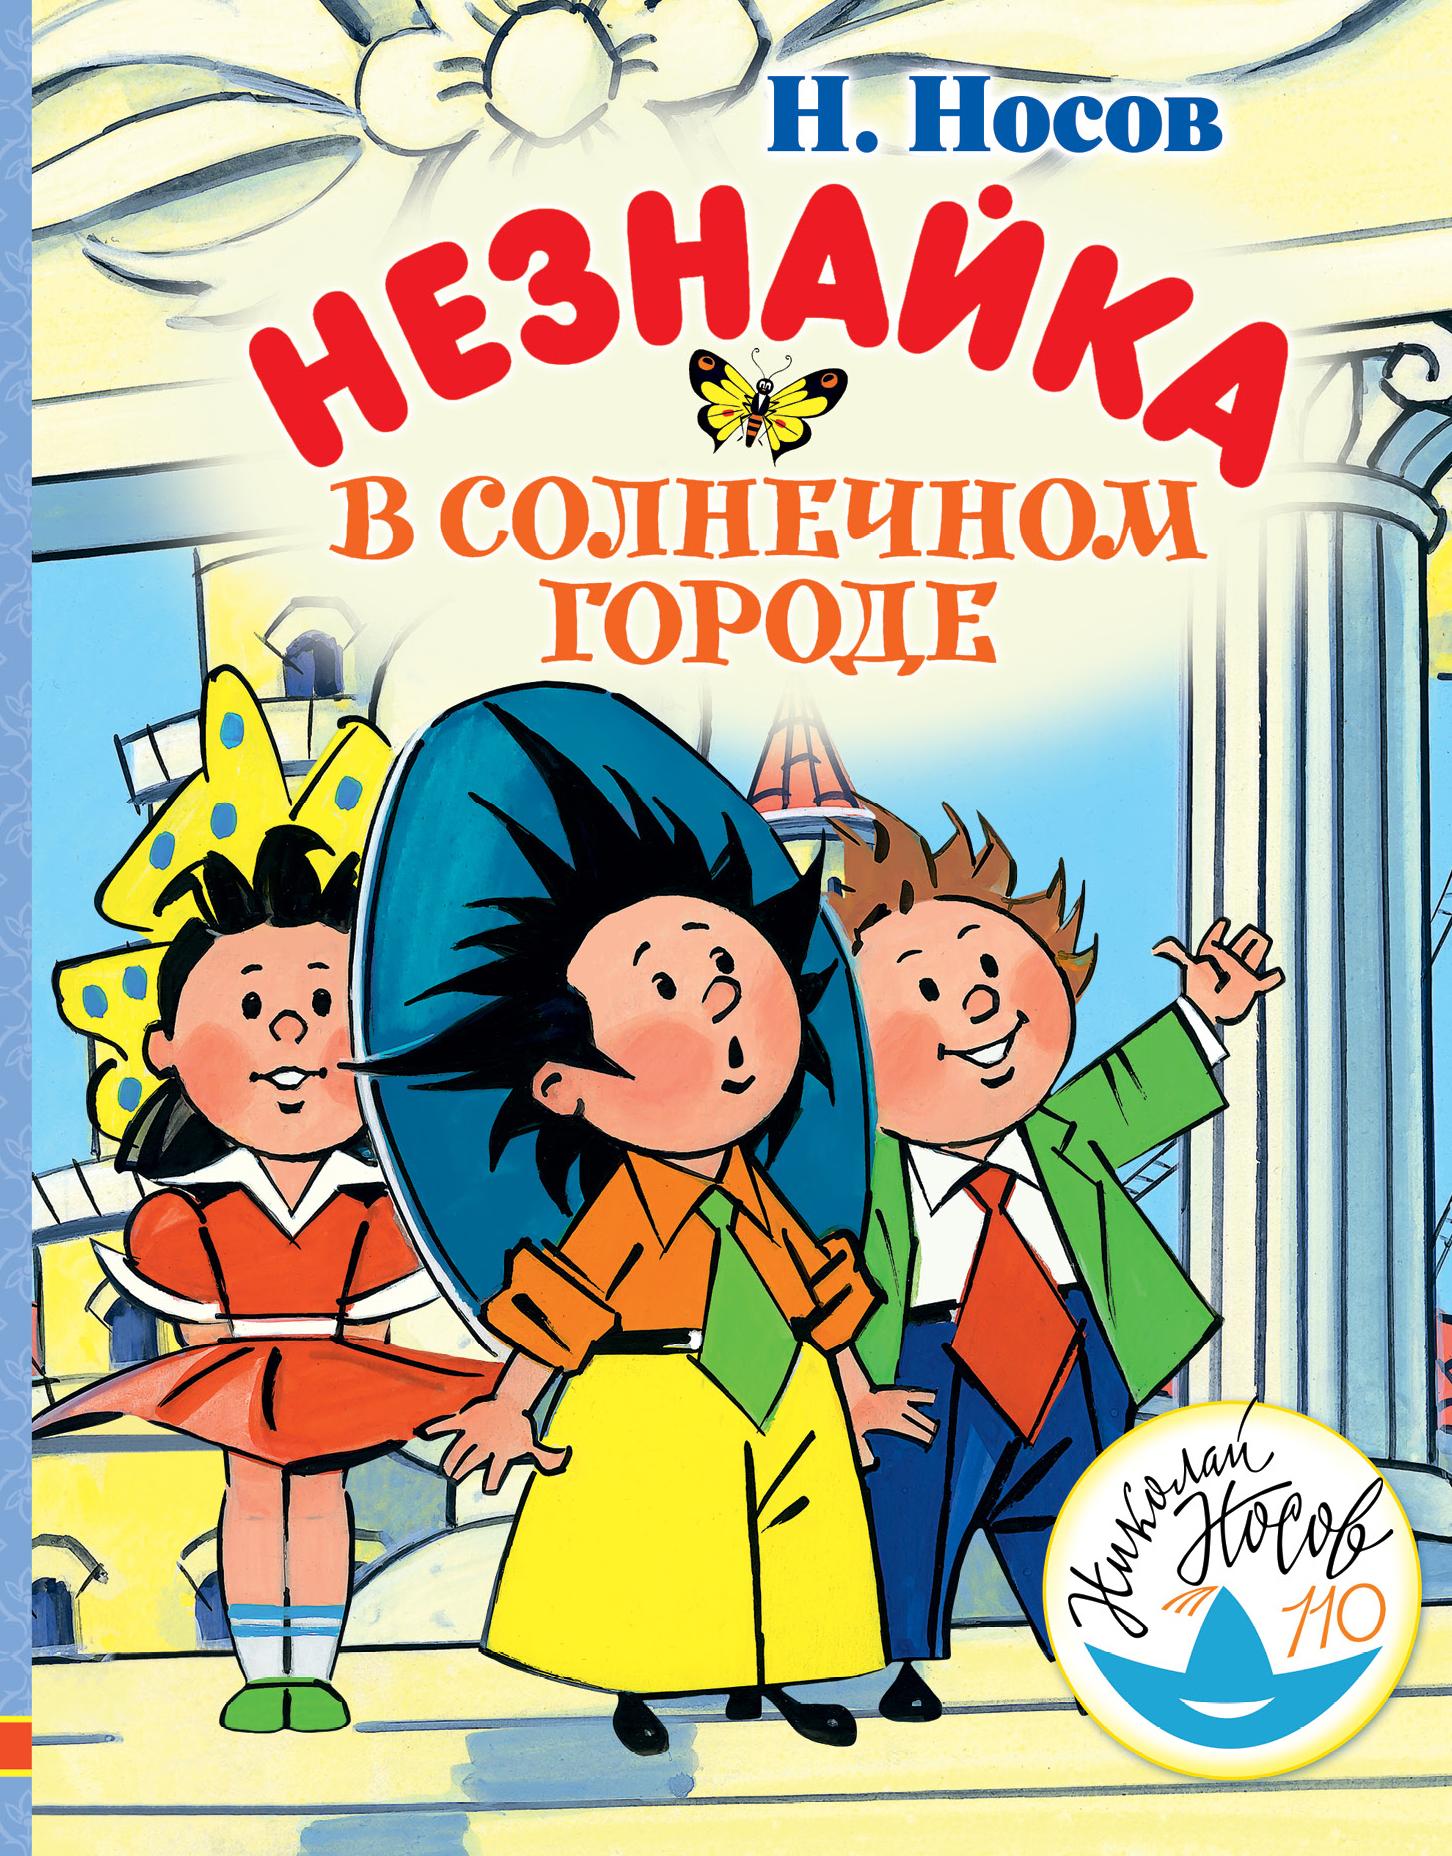 картинки книг про незнайку разница возрасте